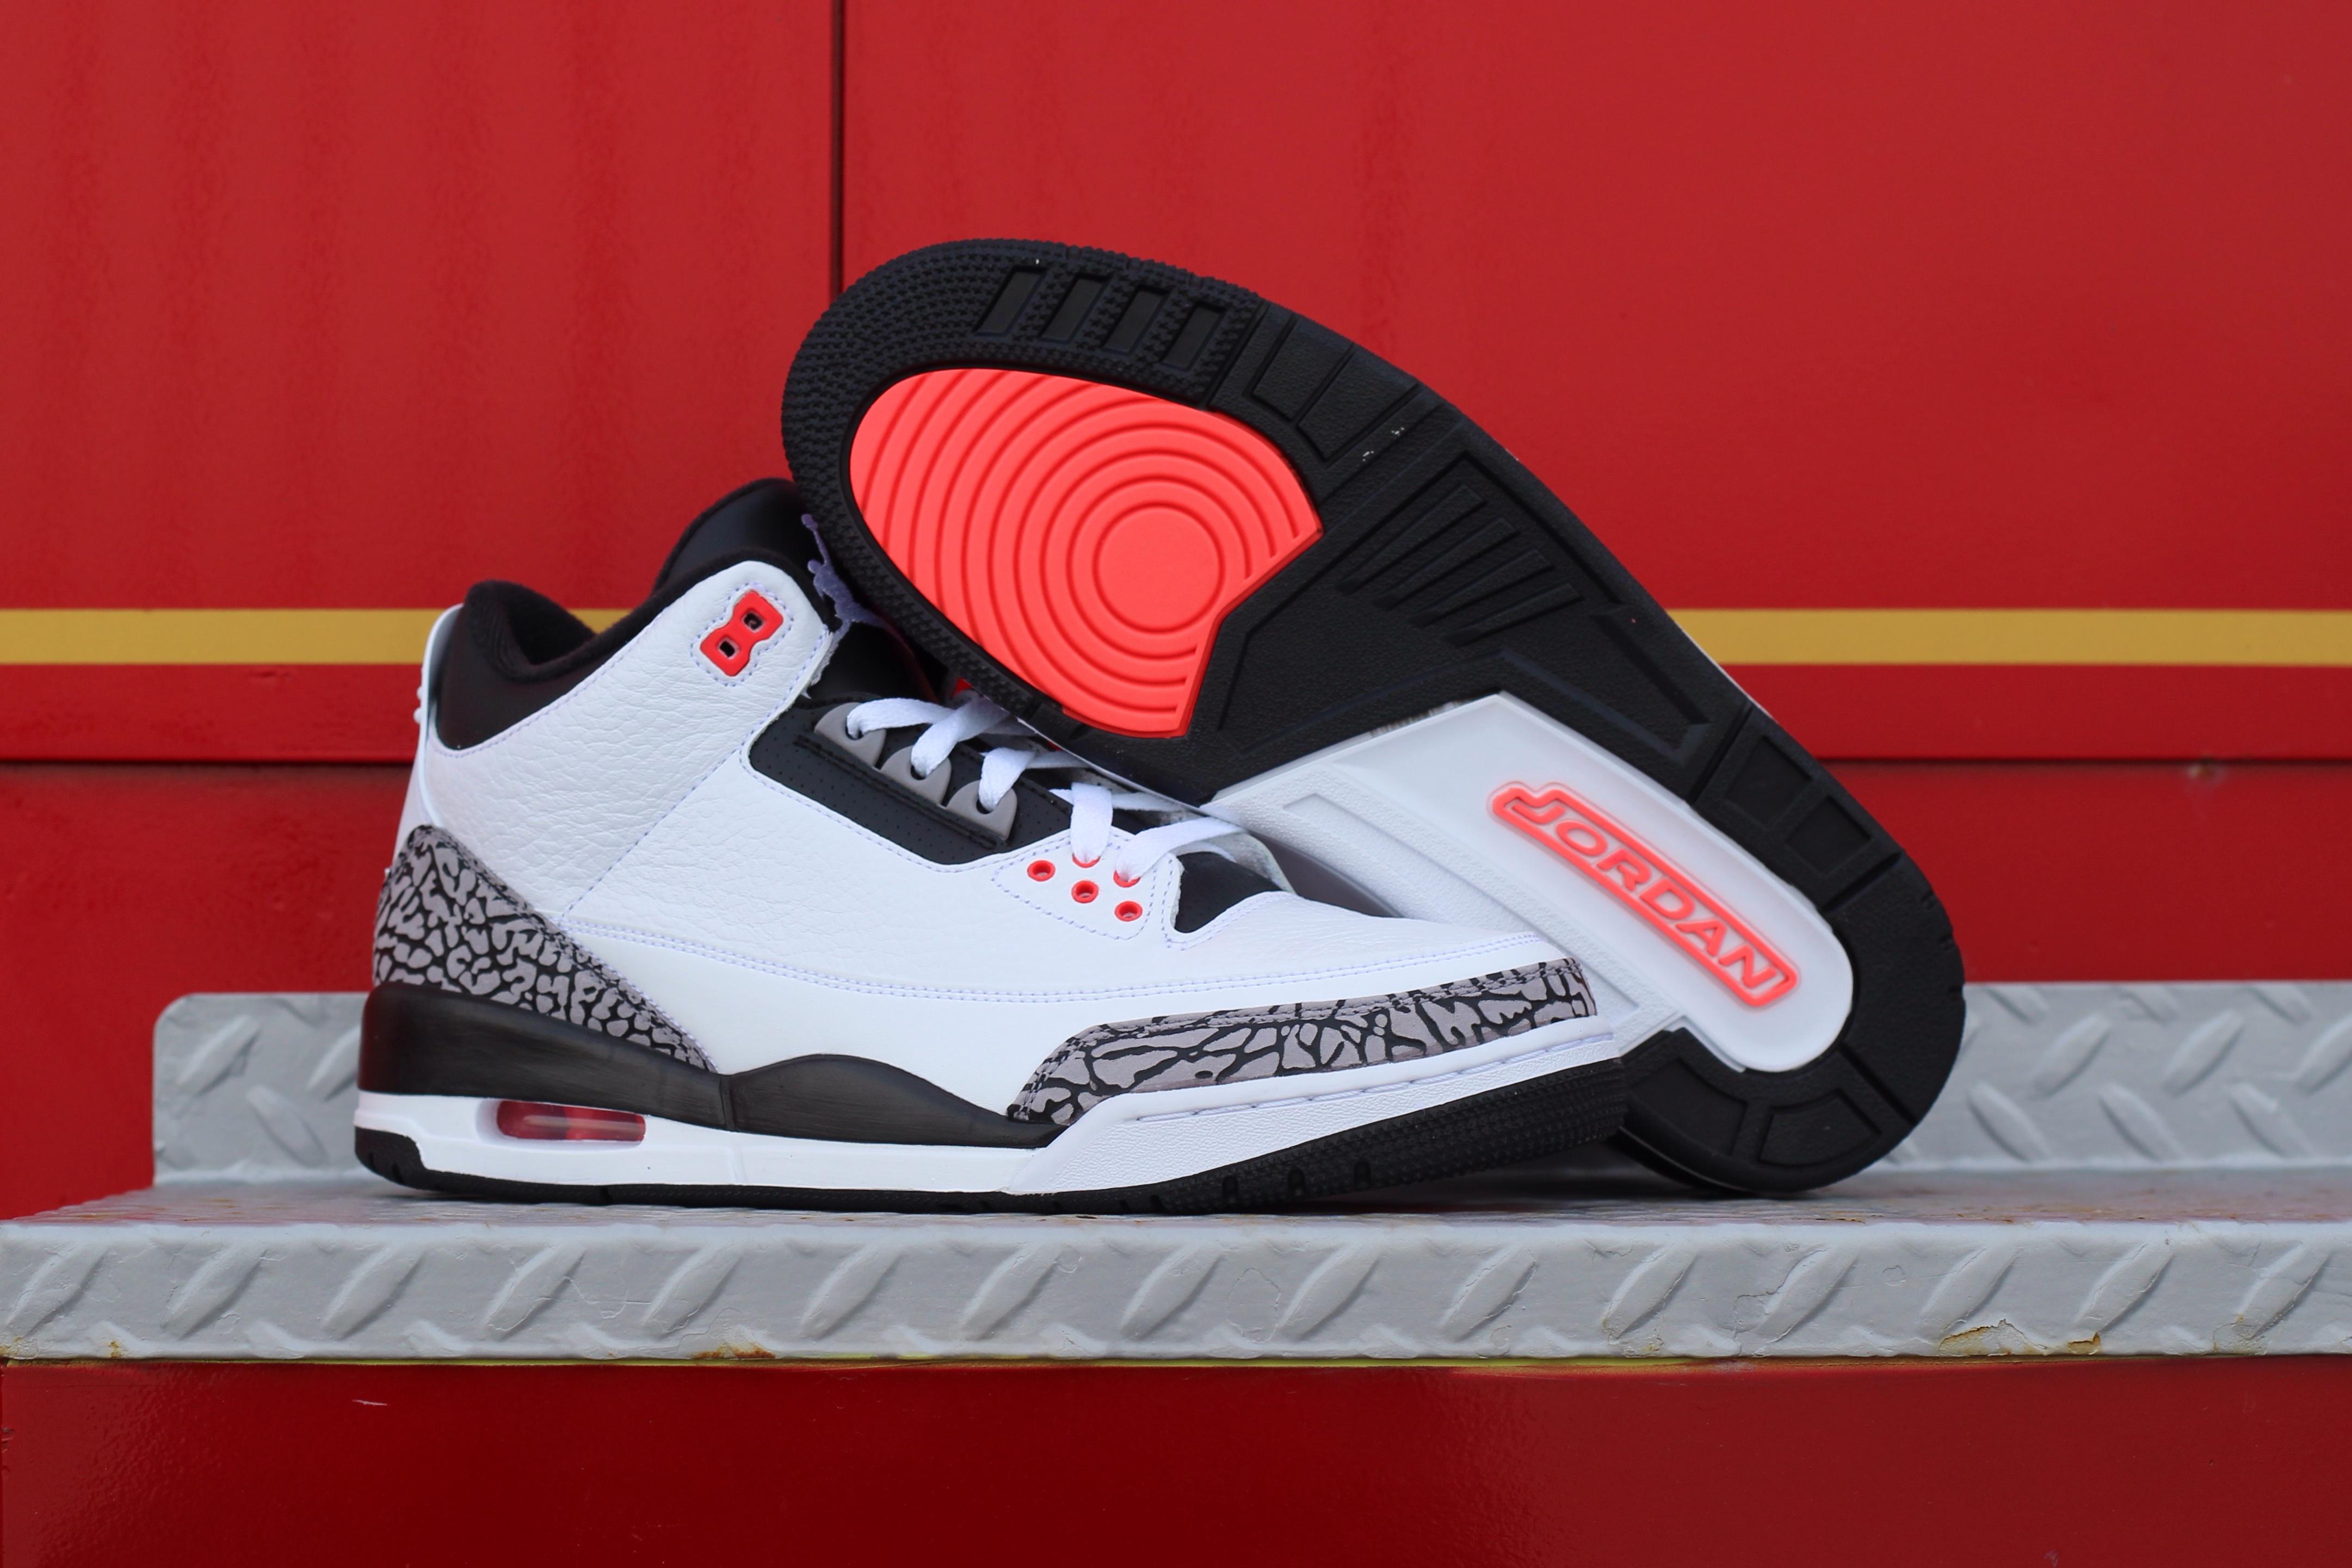 sale retailer 07025 54fe6 Air Jordan 3 Retro 'Infrared 23′- Another Look - WearTesters